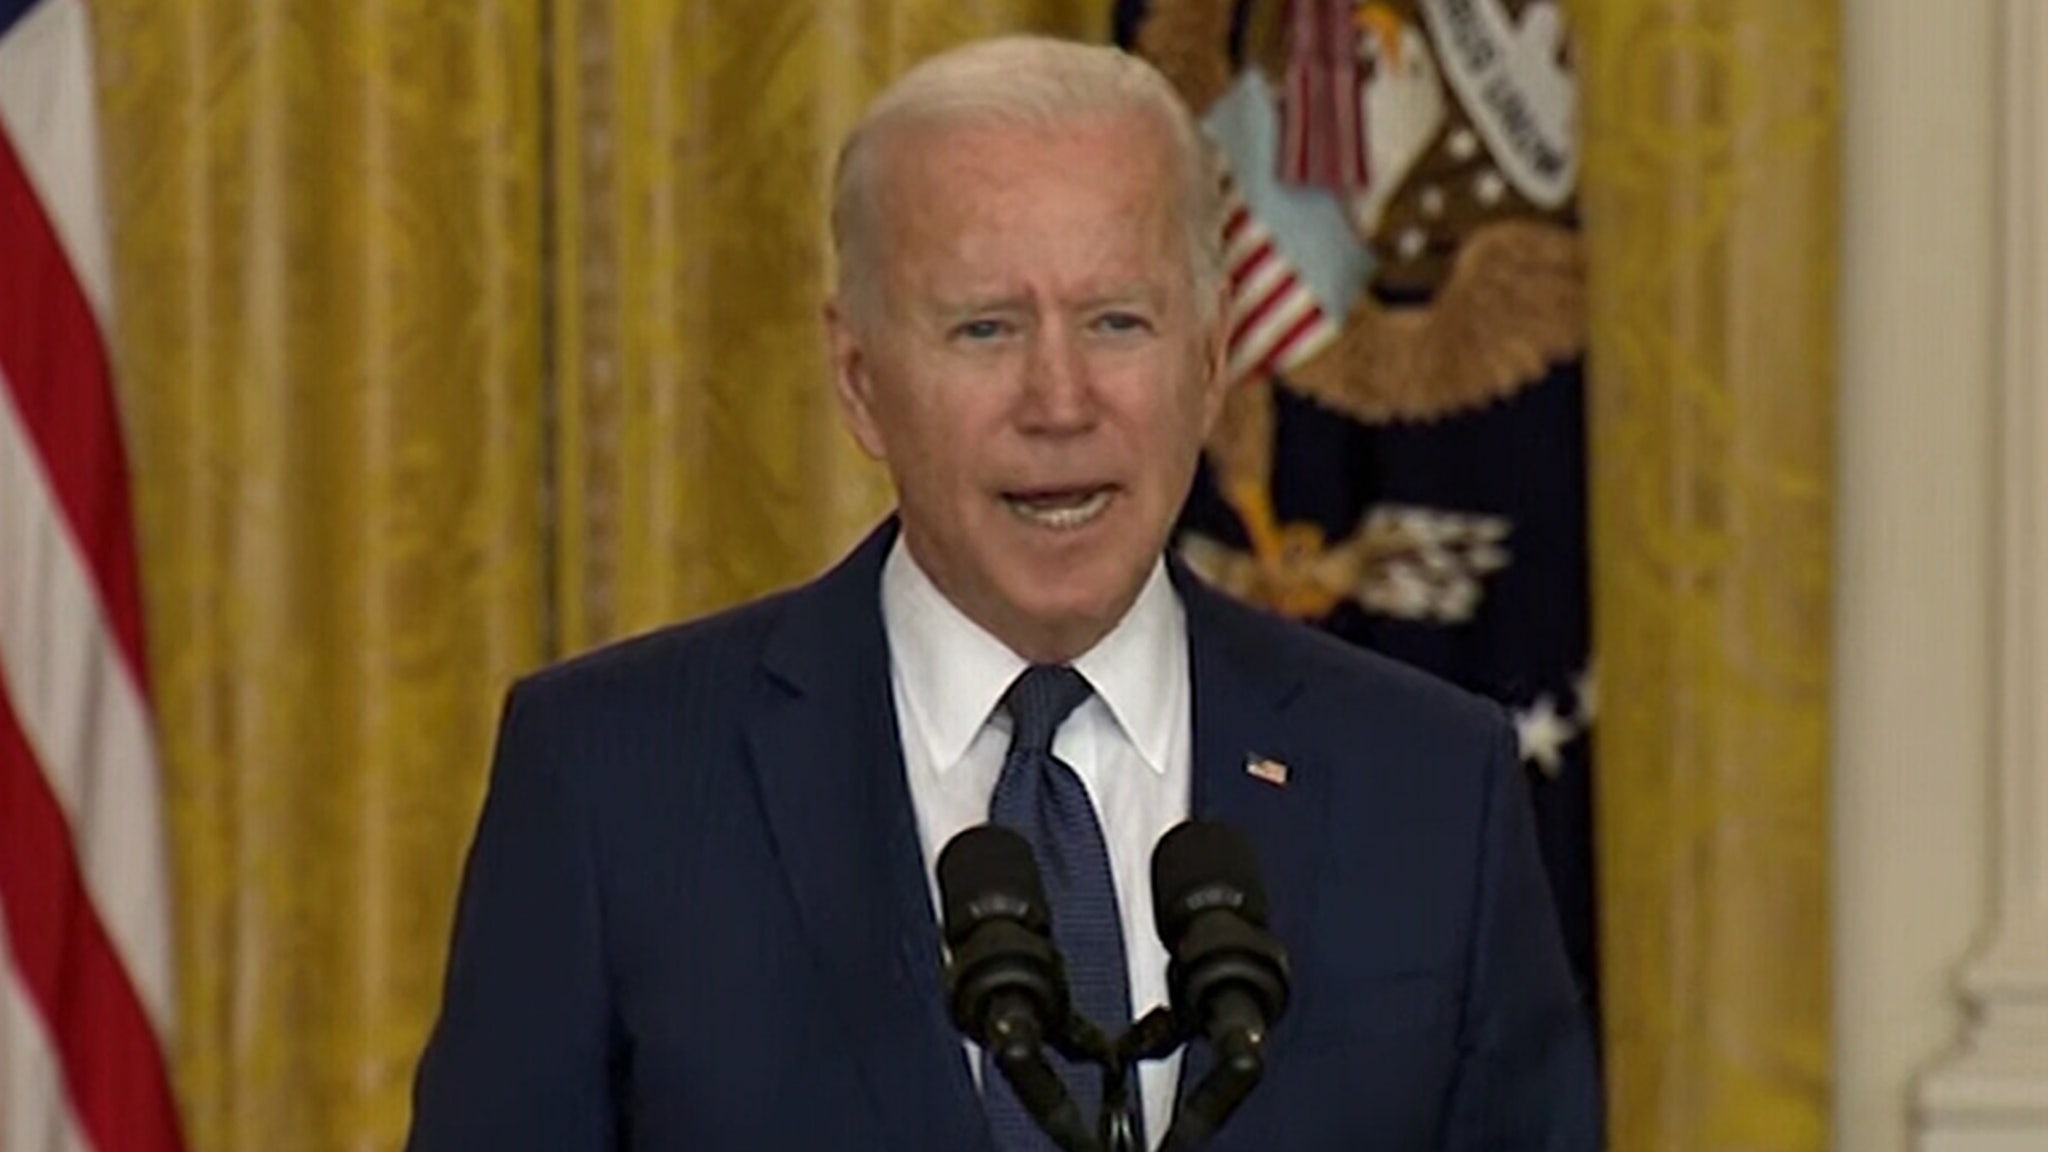 President Biden Promises to Hunt Down ISIS Terrorists in Emotional Speech